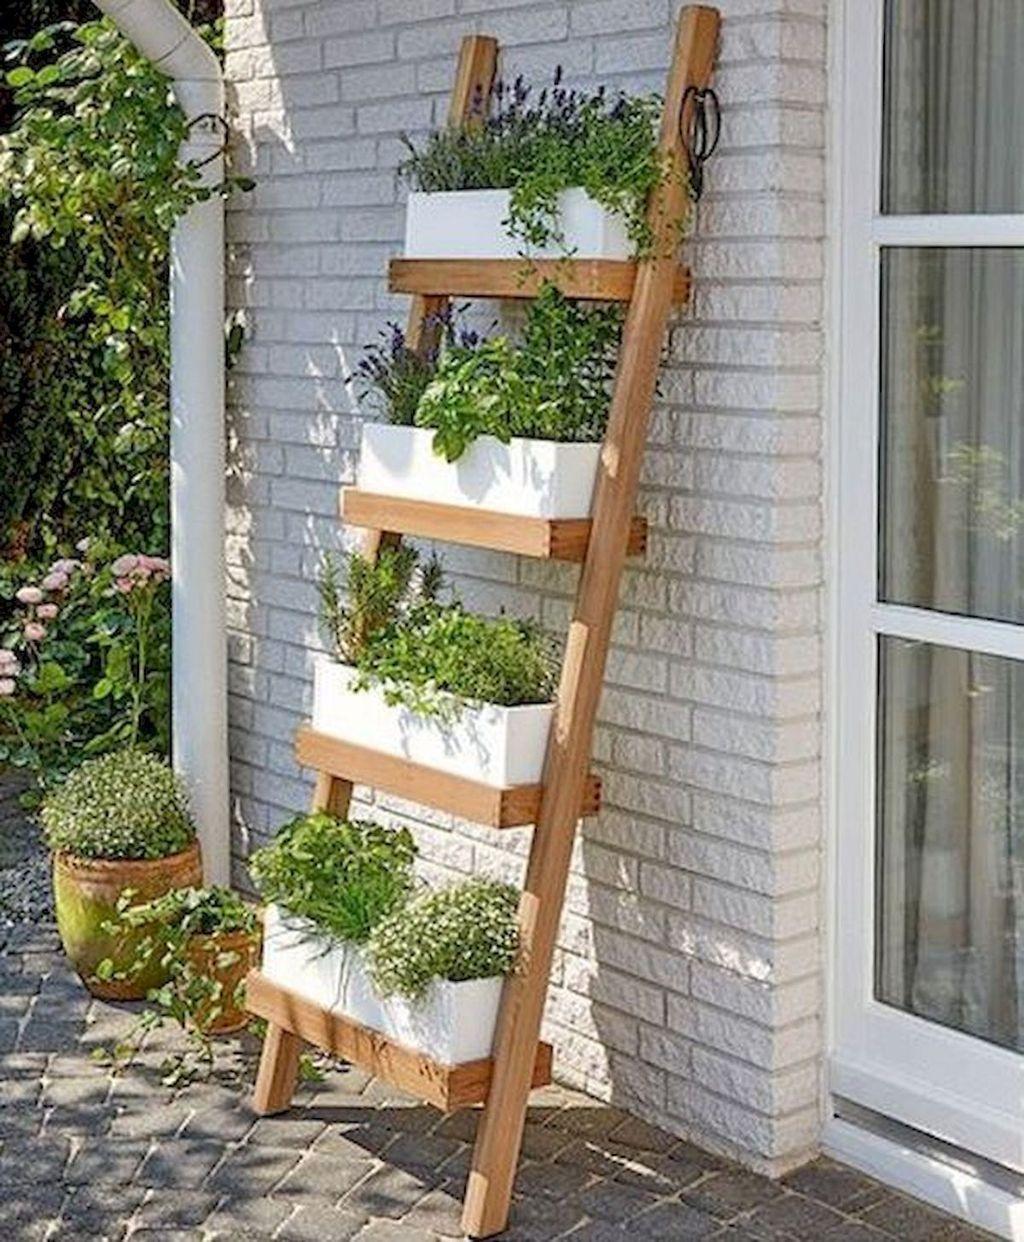 55 Top Inspiring Vertical Garden Design Ideas and Remodel